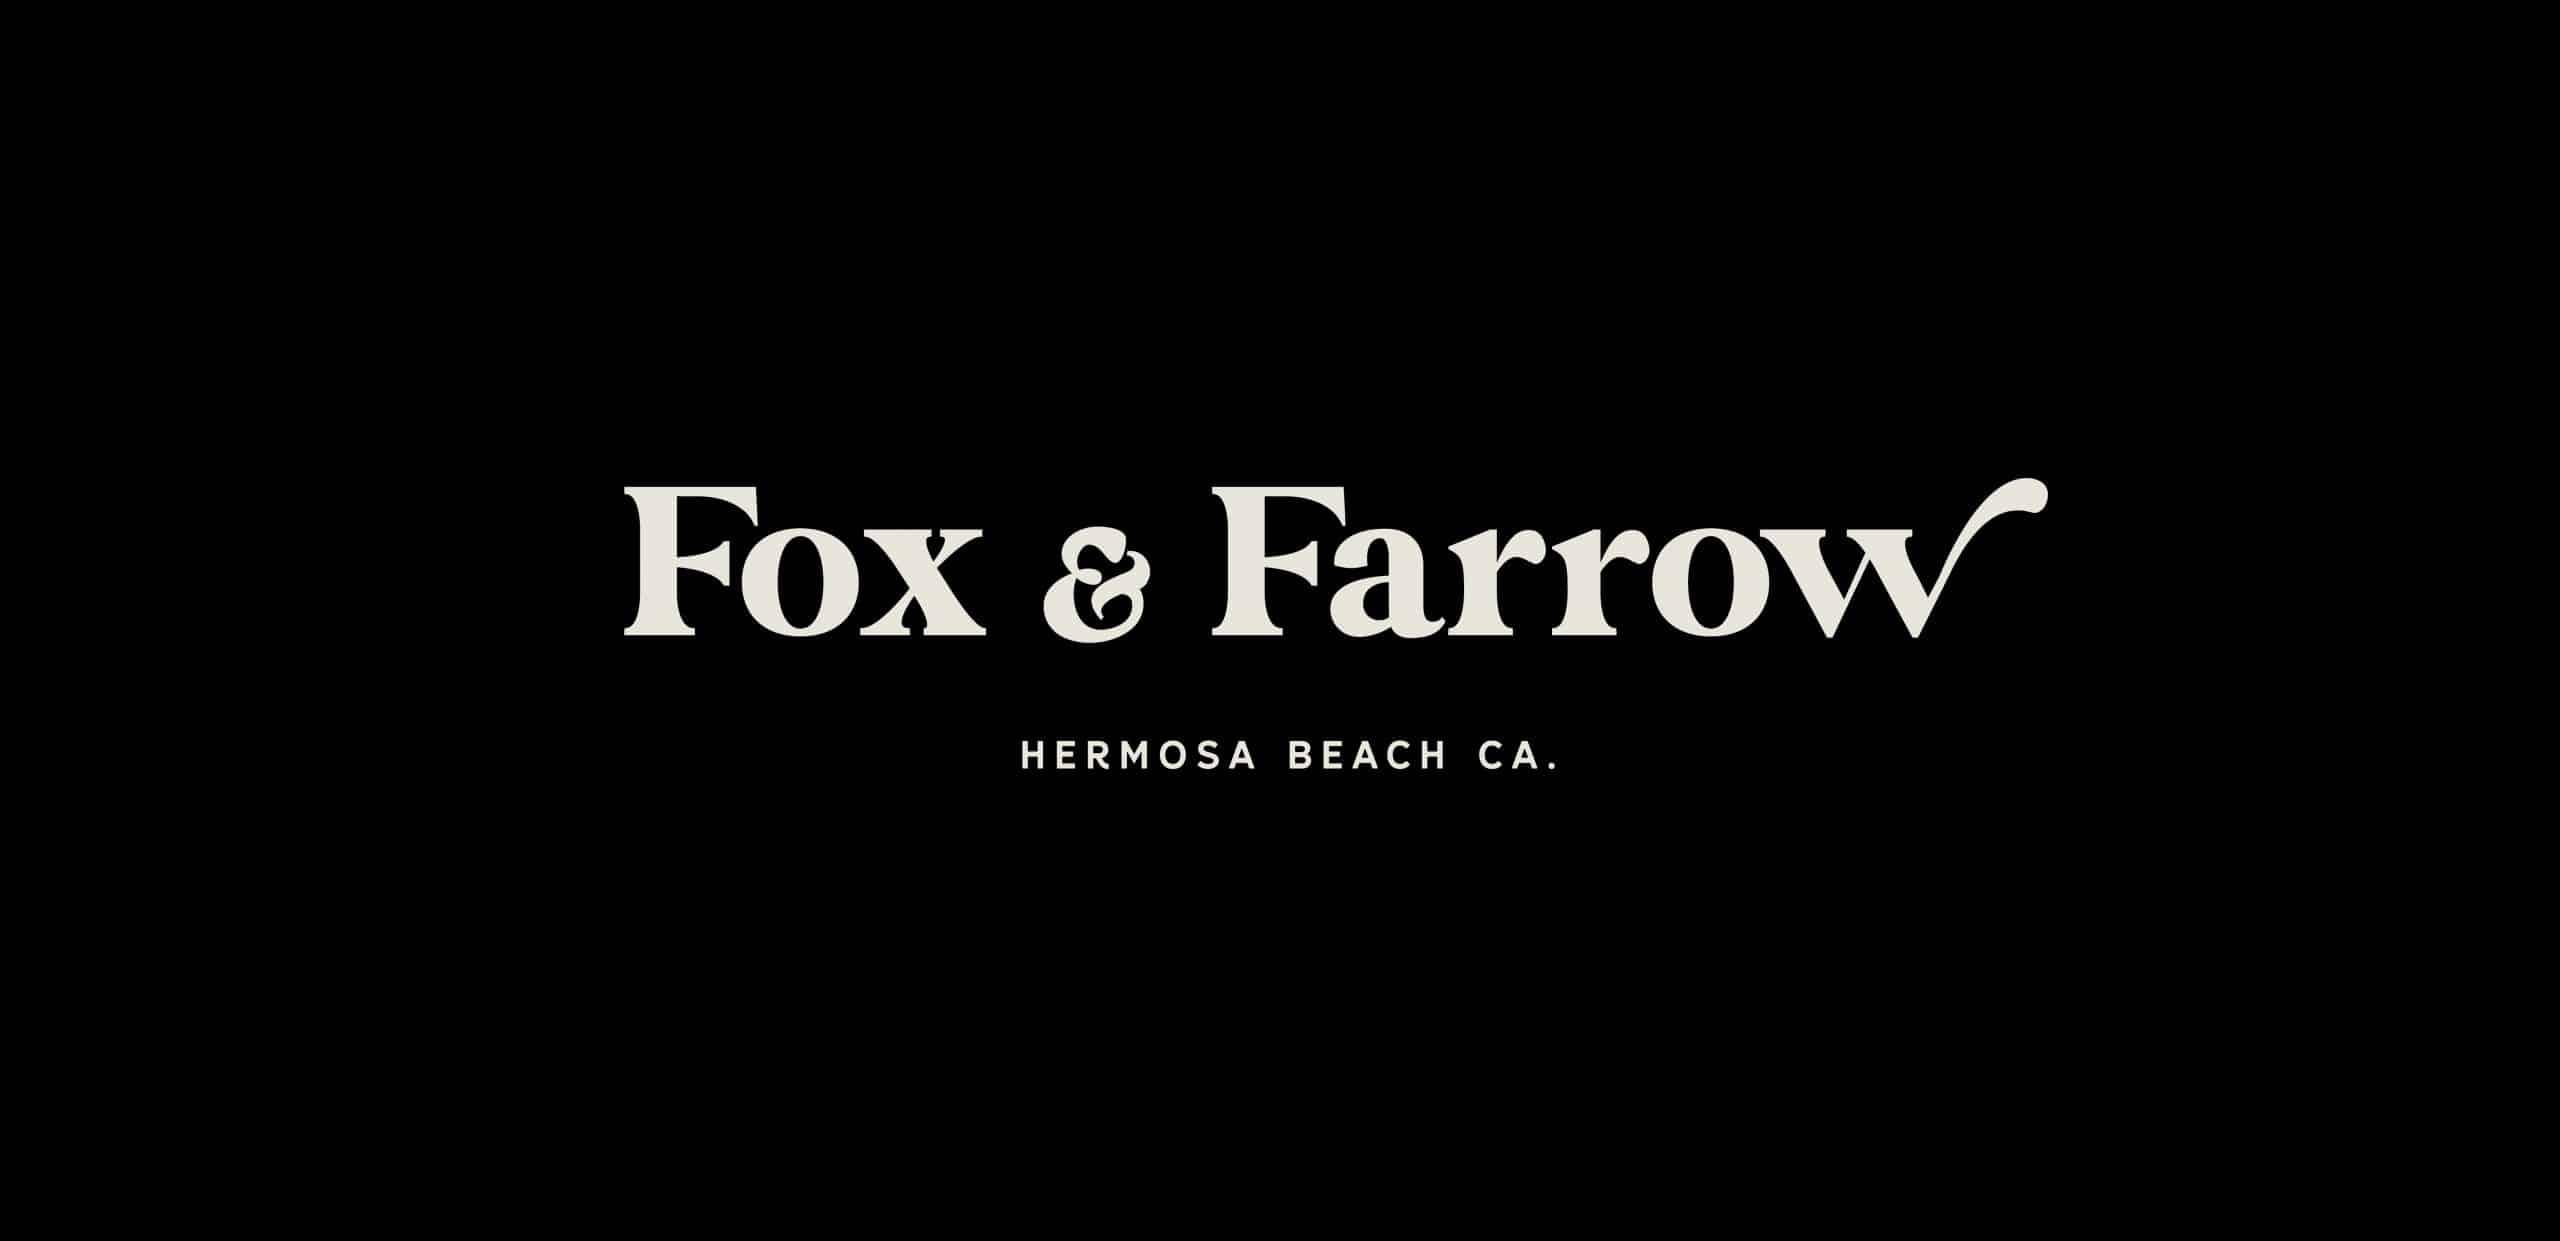 Stellen_Design_Fox_Farrow_Resturant_Branding_Logo_Design-03